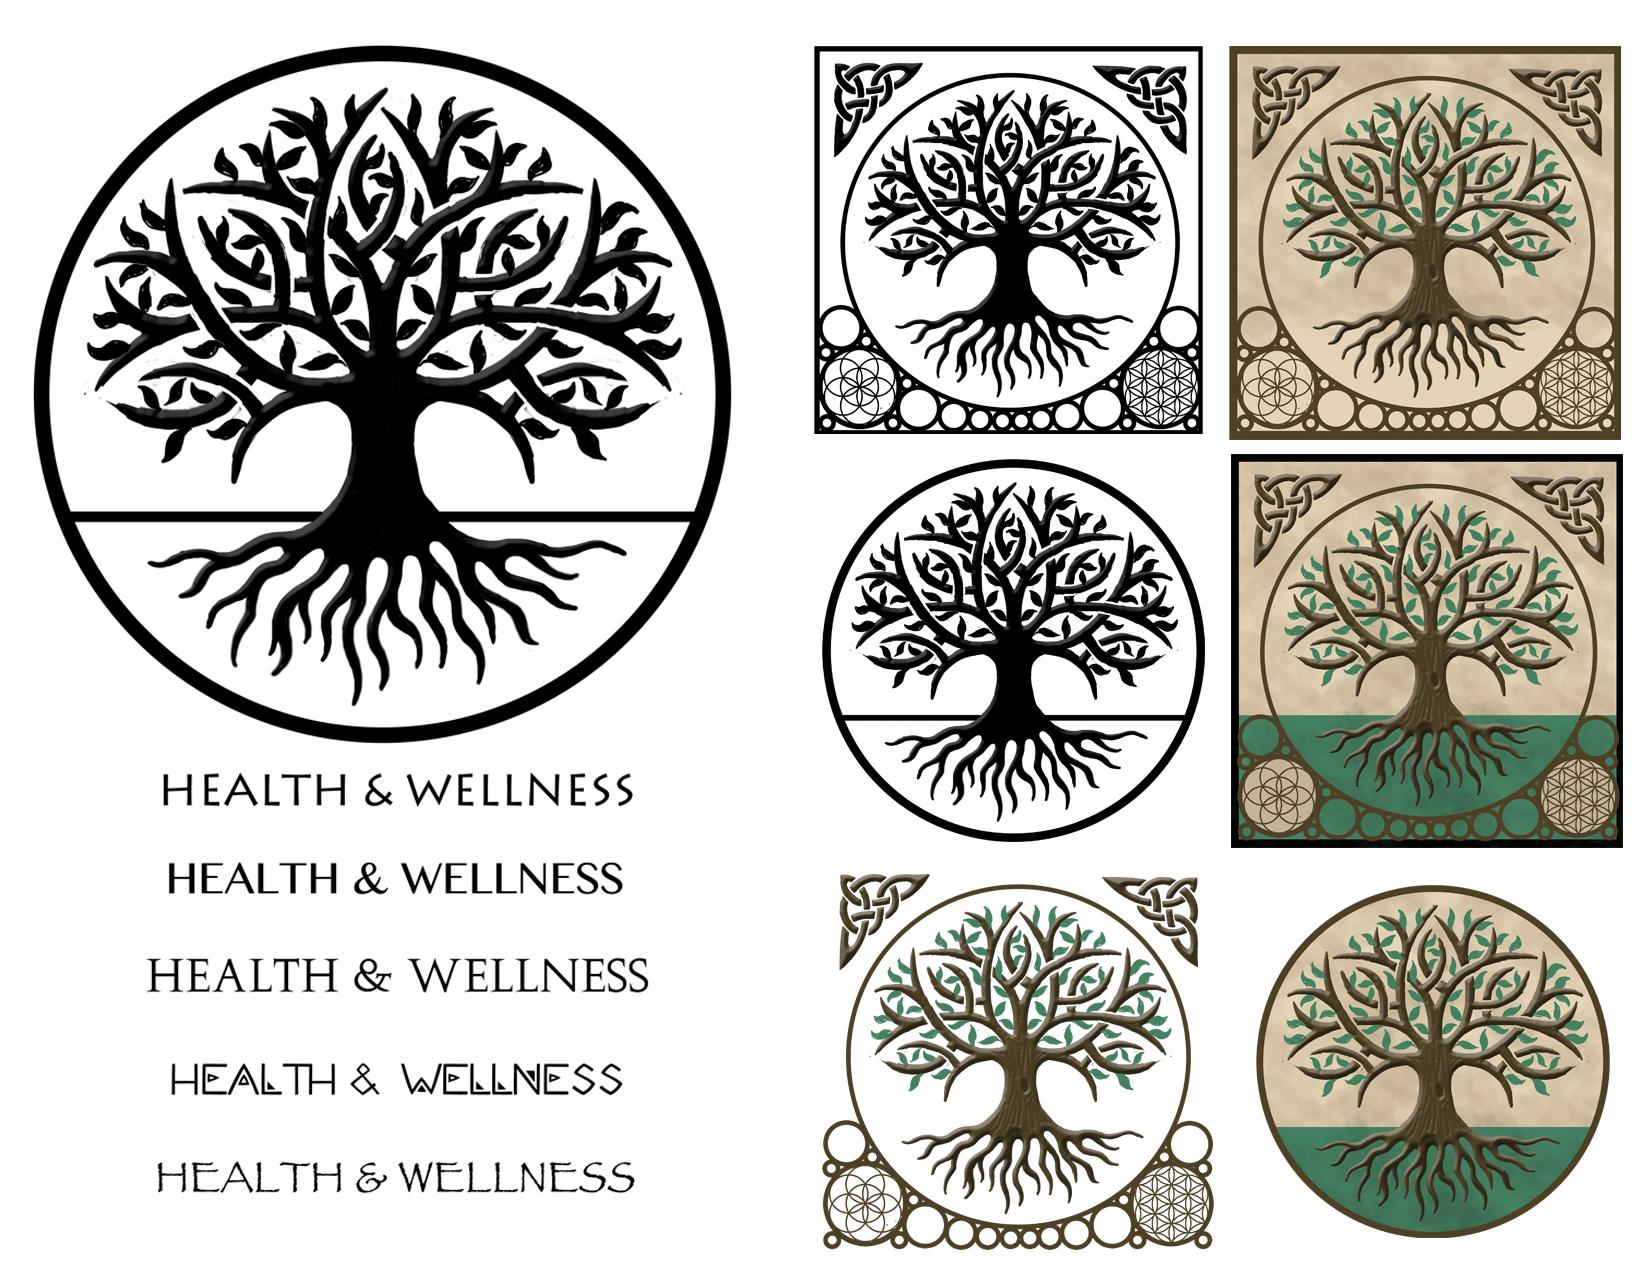 LIFE TREE Logos